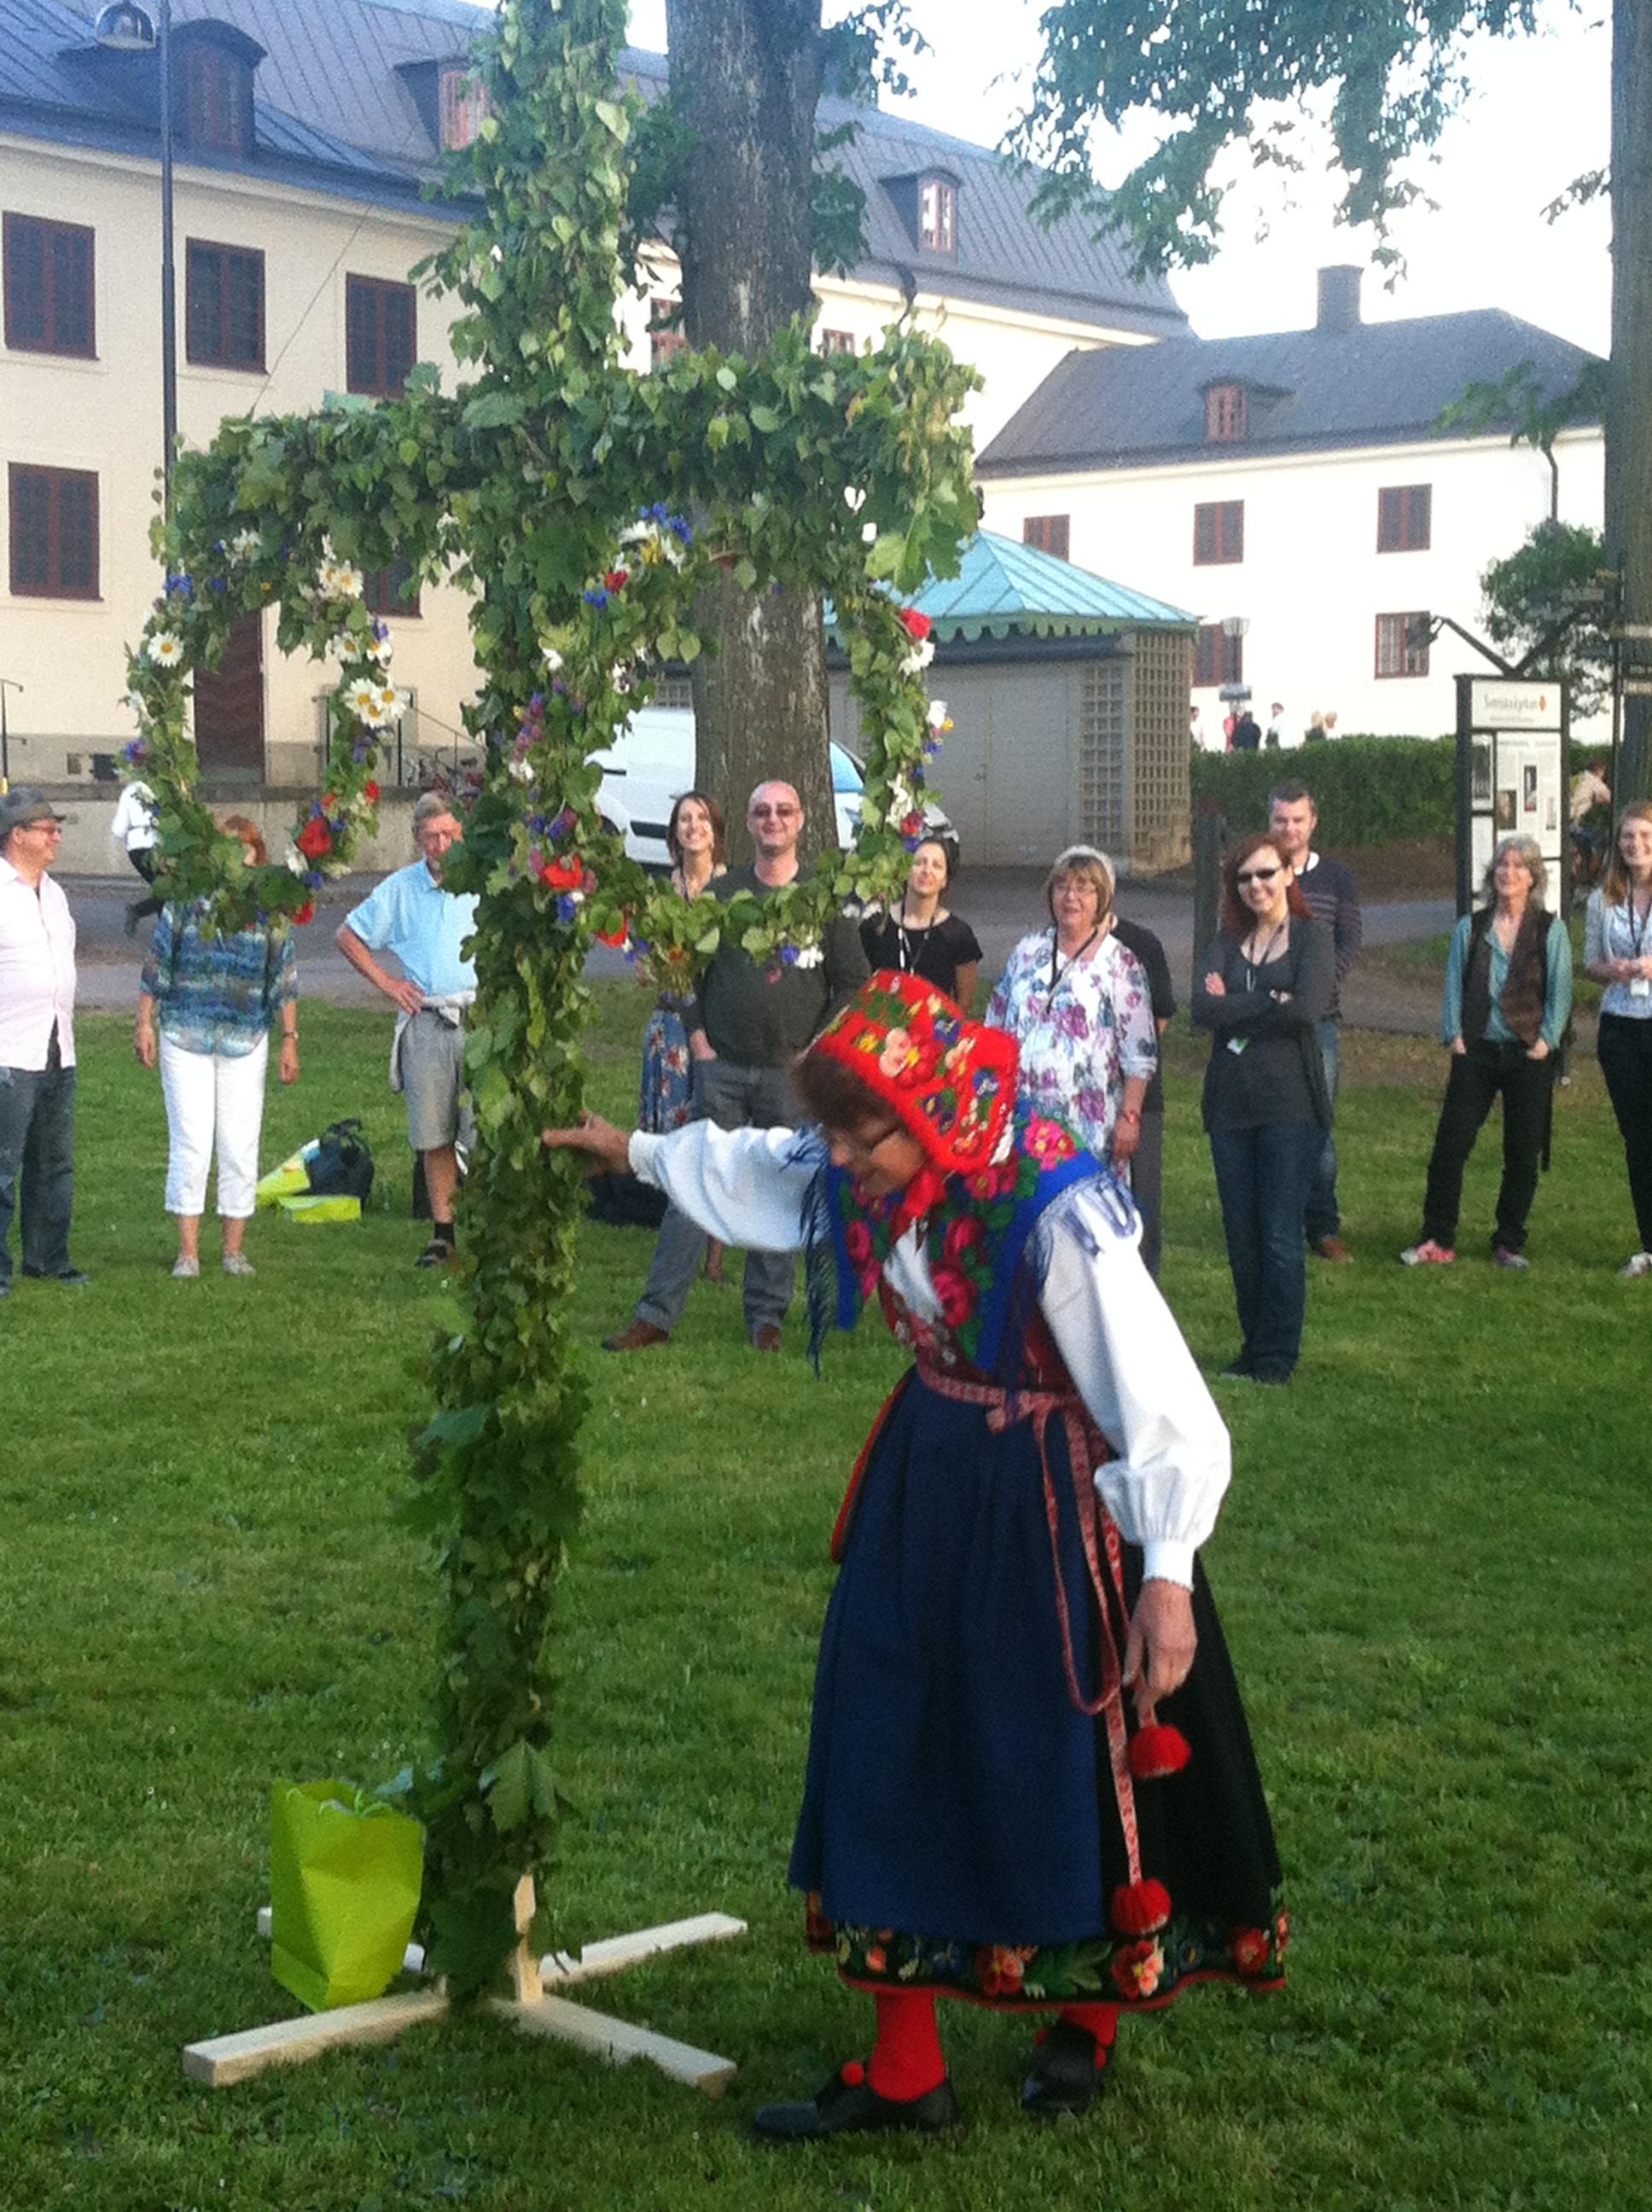 Traditional Midsummer celebrations